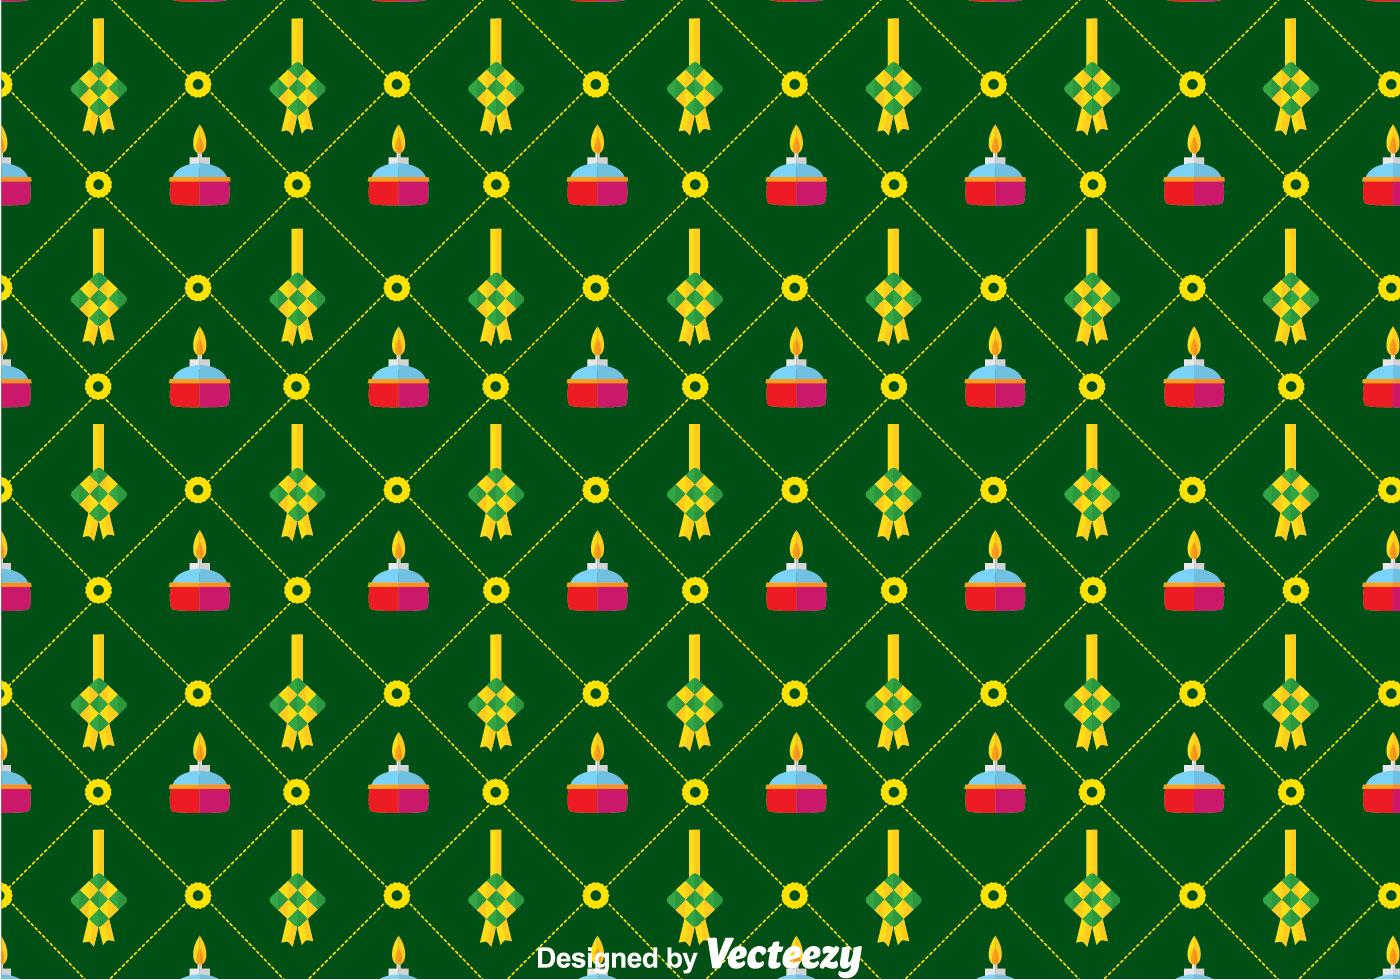 Wallpaper Doodle Cute Flat Ketupat Pattern Background Download Free Vector Art